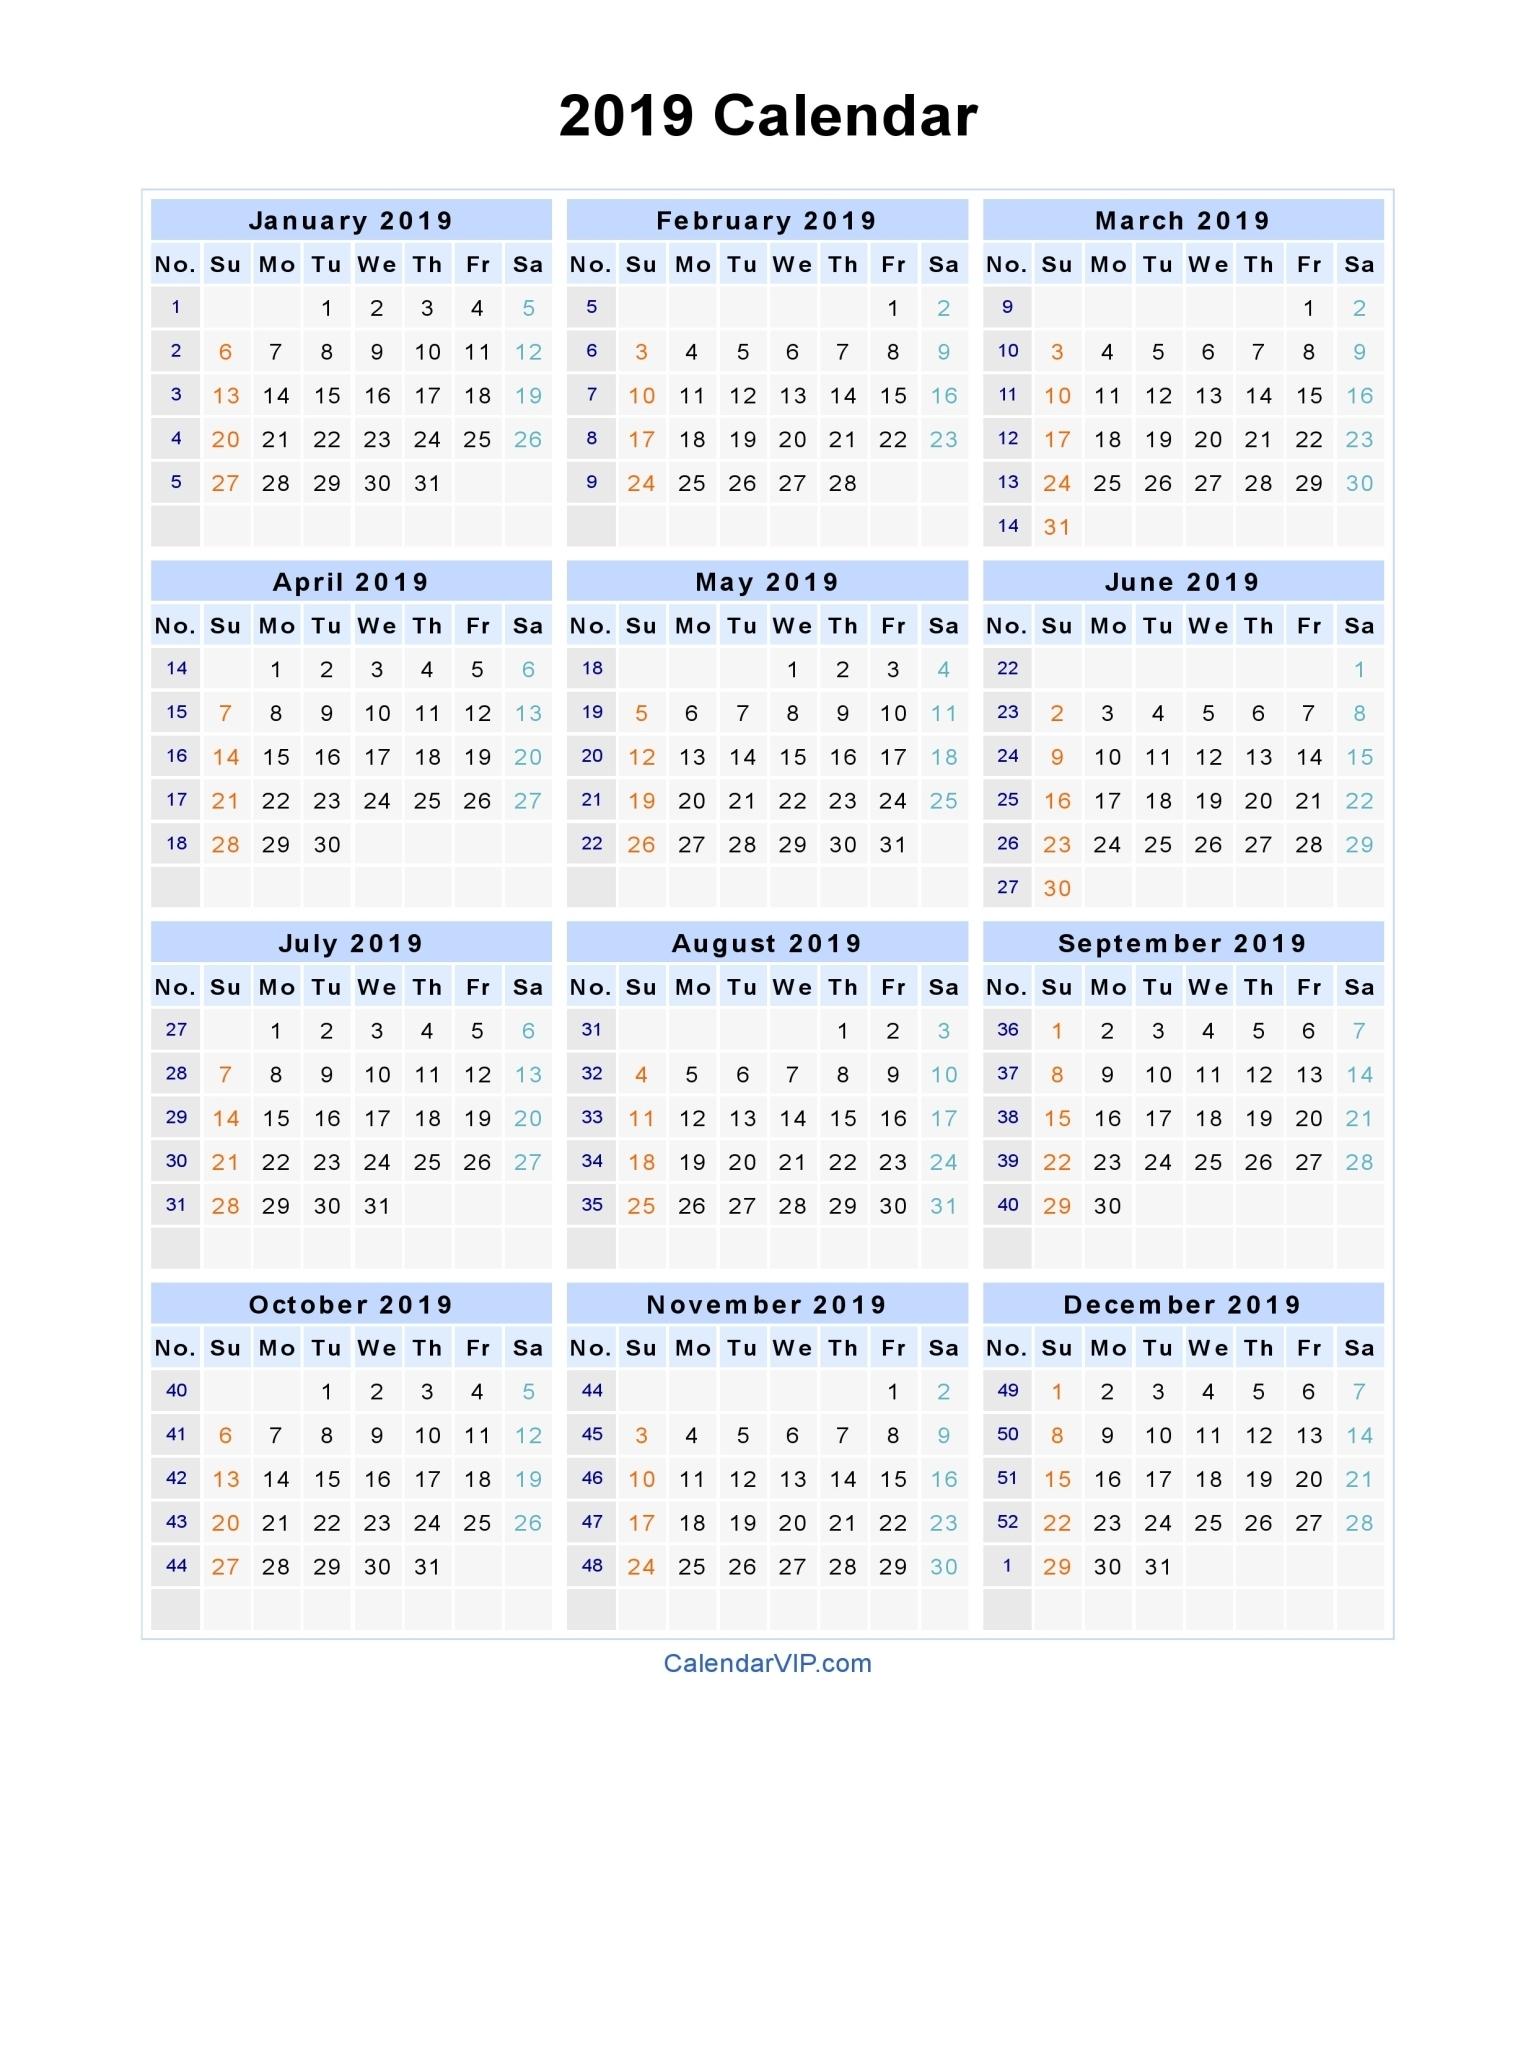 2019 Calendar - Blank Printable Calendar Template In Pdf